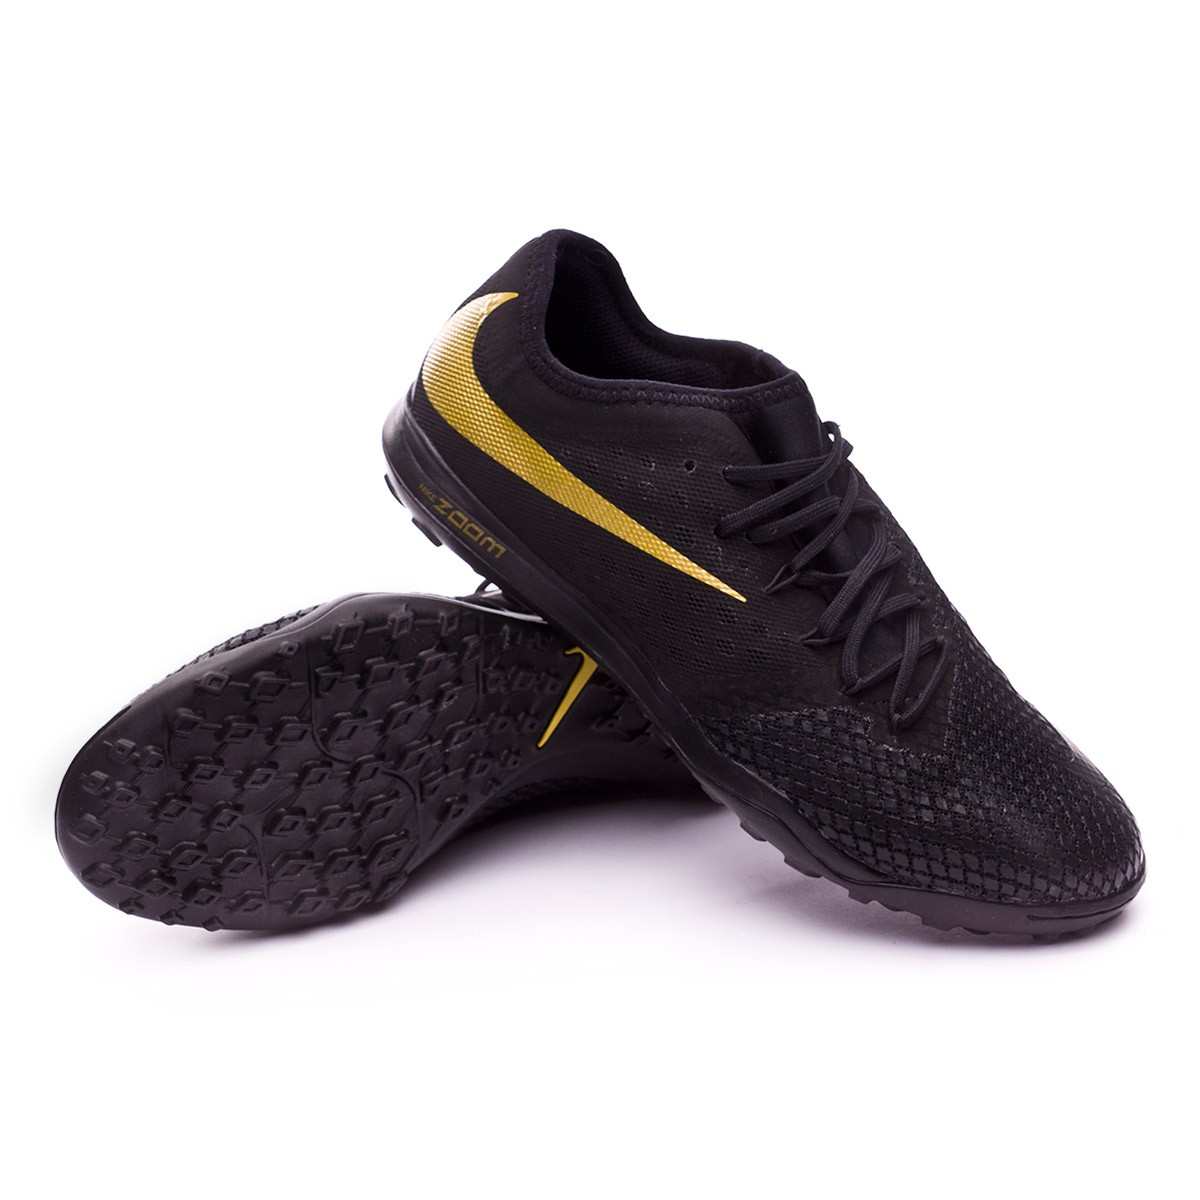 Football Boot Nike Hypervenom Zoom PhantomX III Pro Turf Black ... 094b40787